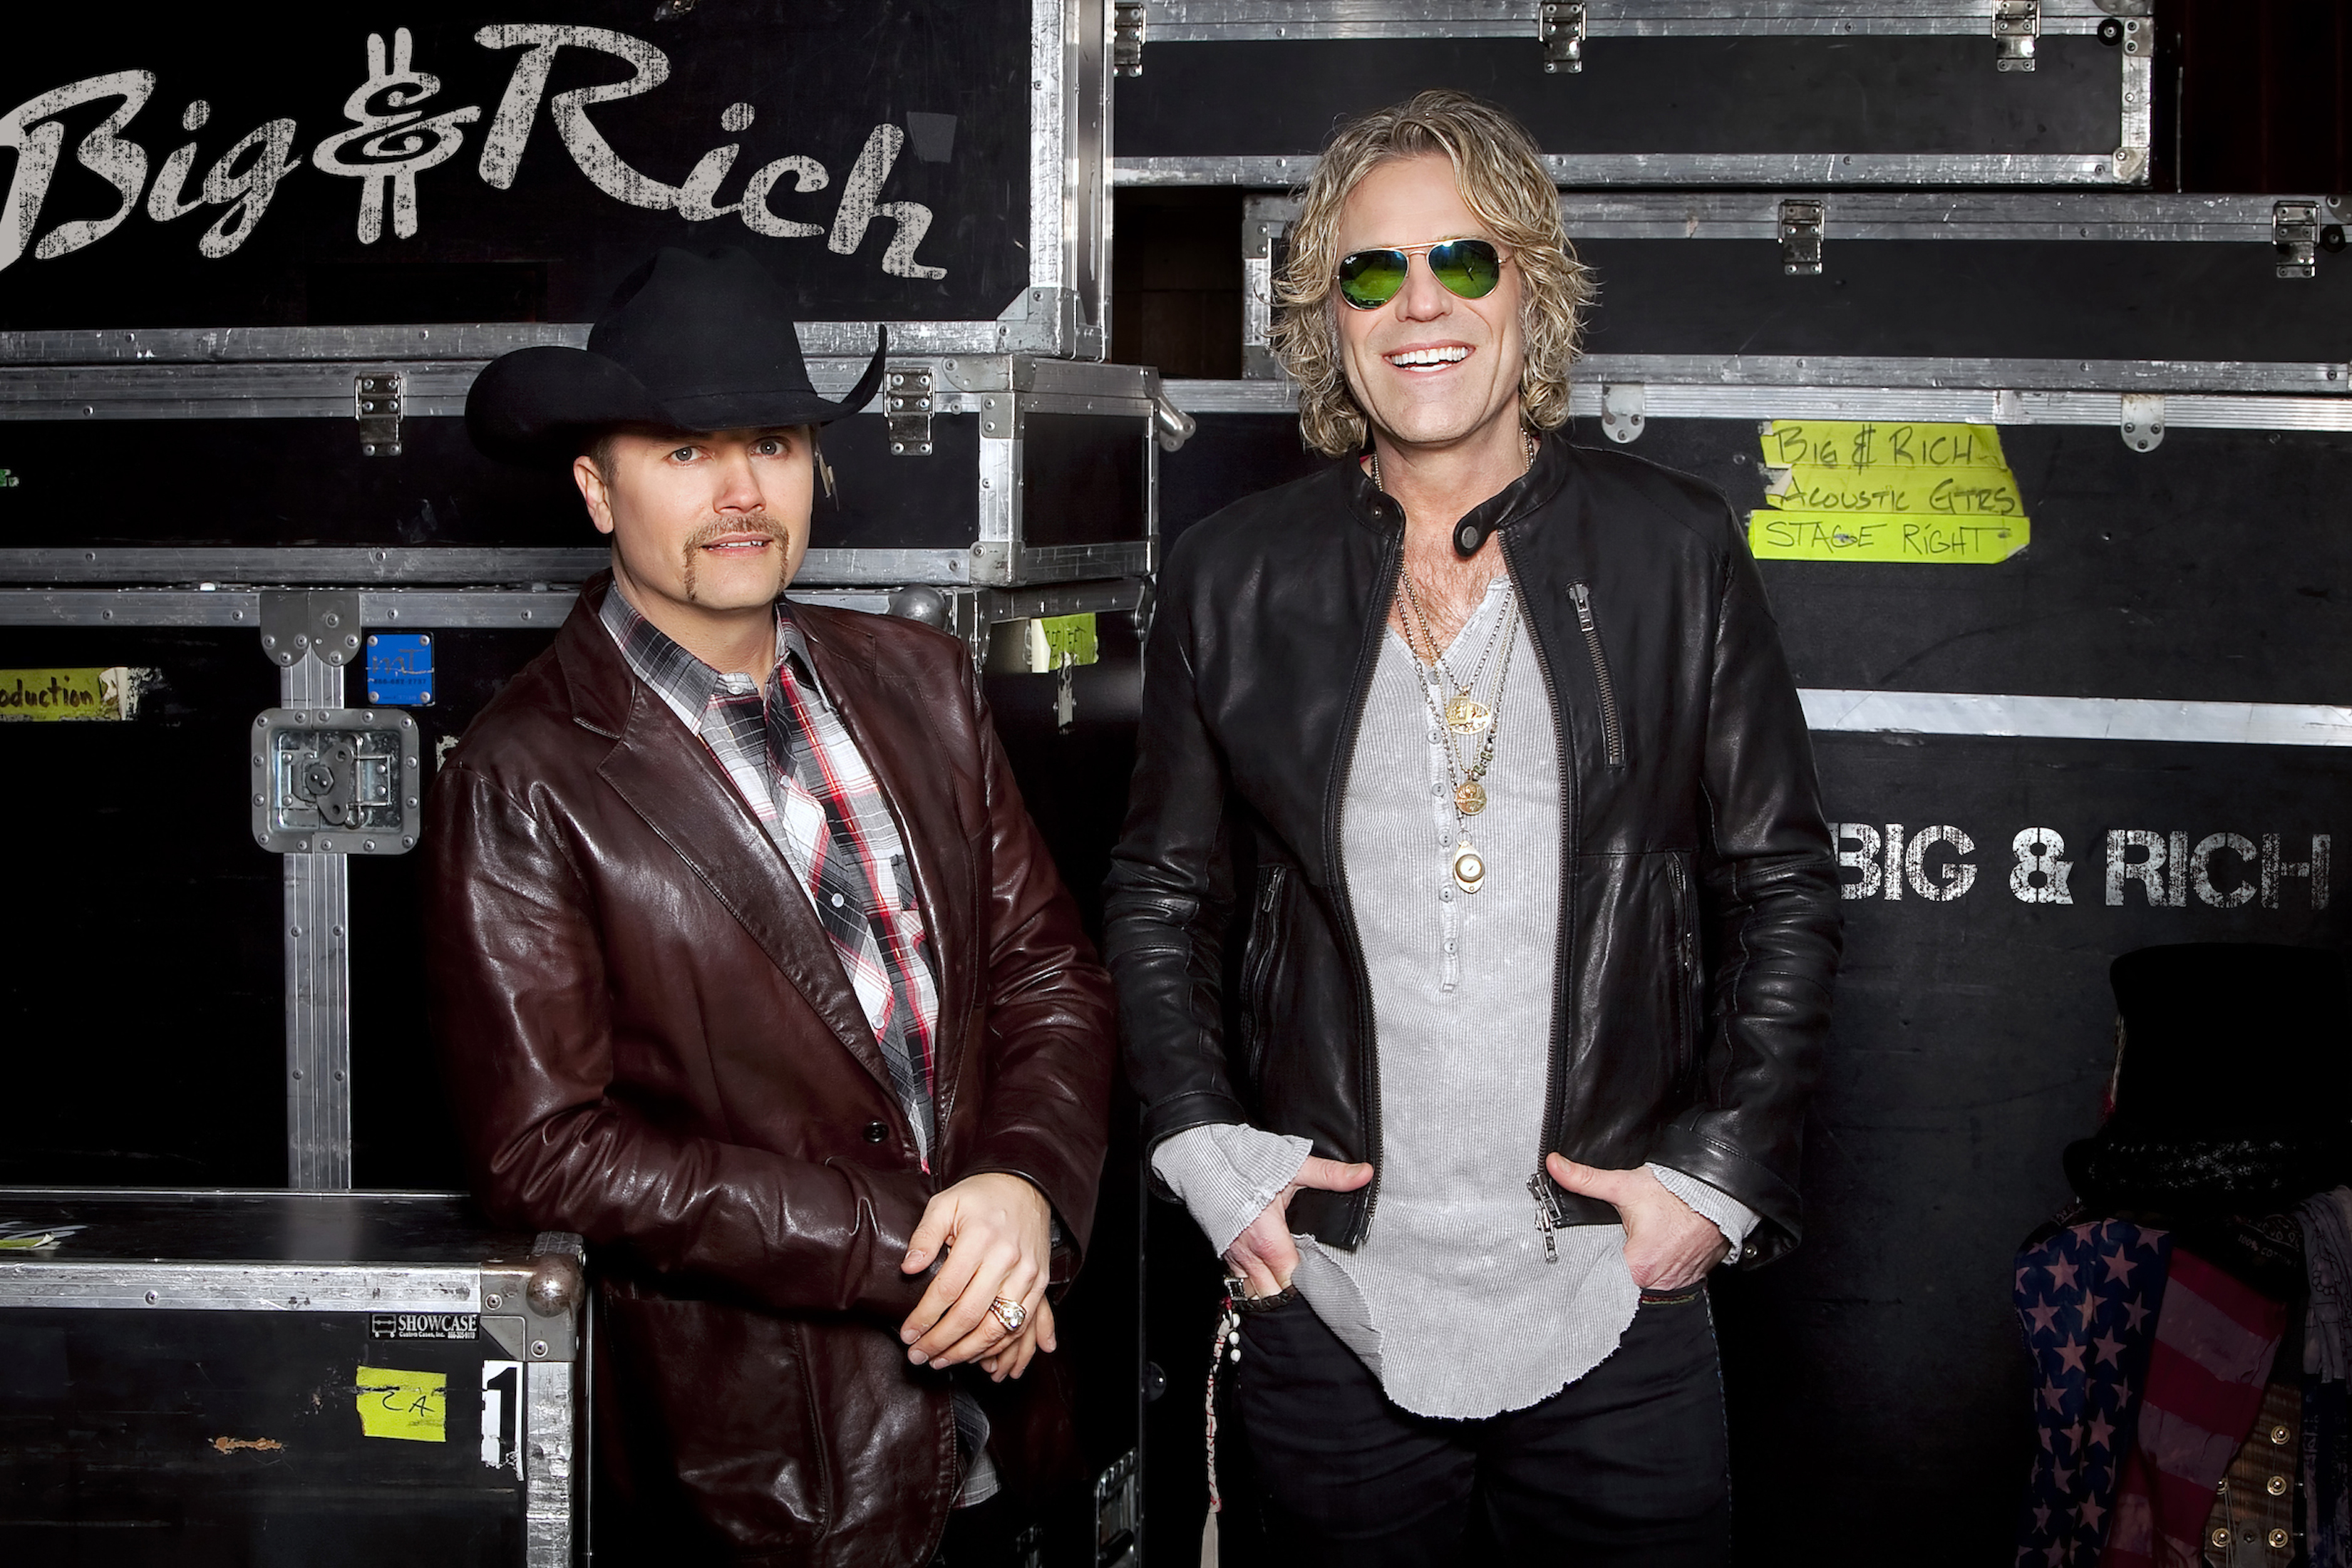 Big & Rich at the Island Showroom